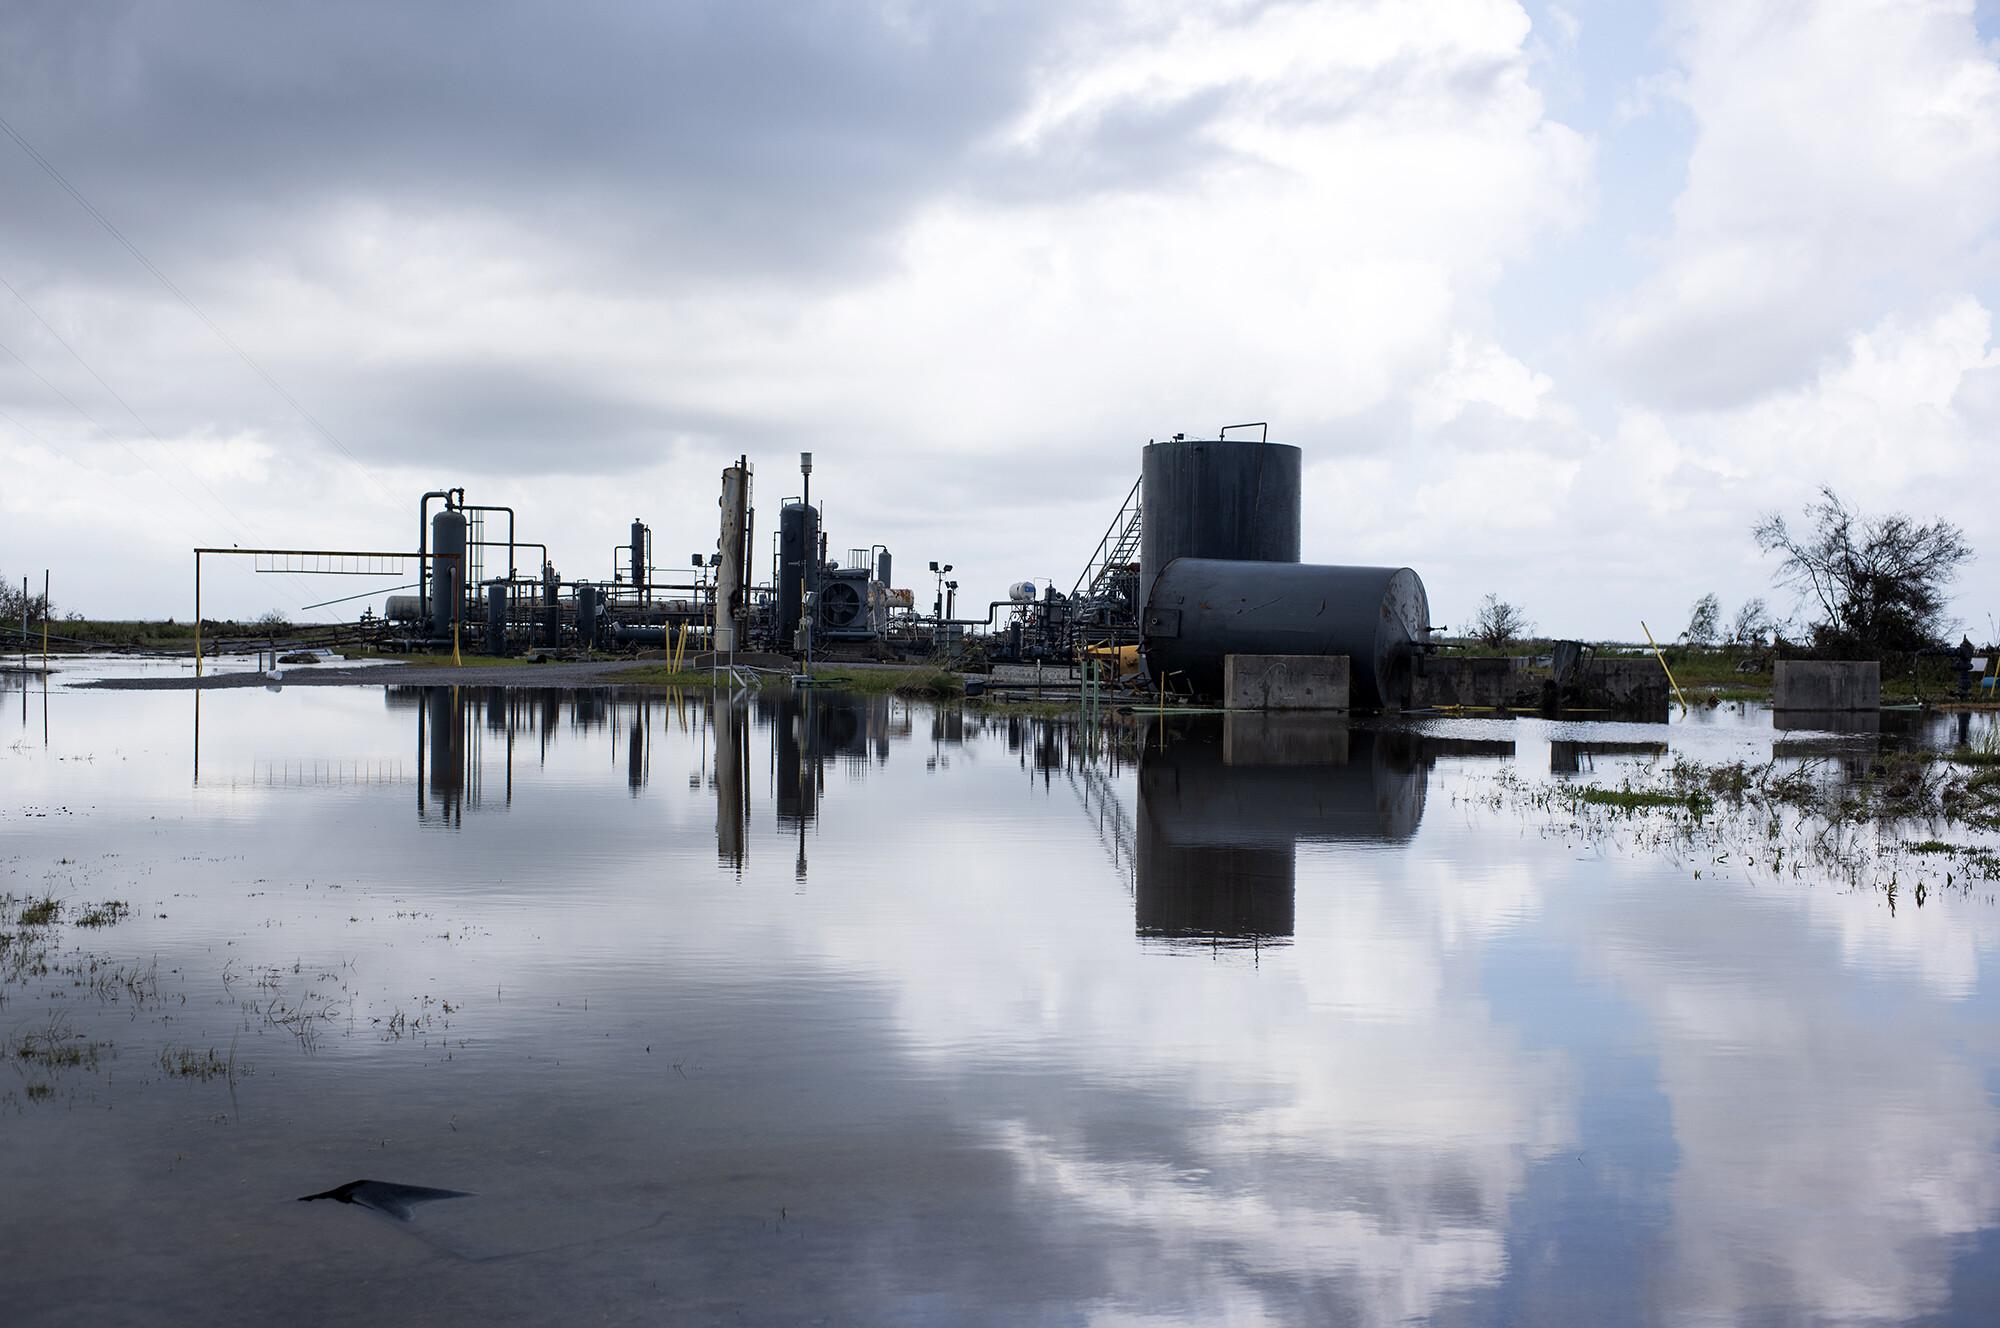 Biden administration taps emergency oil stockpile amid Louisiana gas crisis